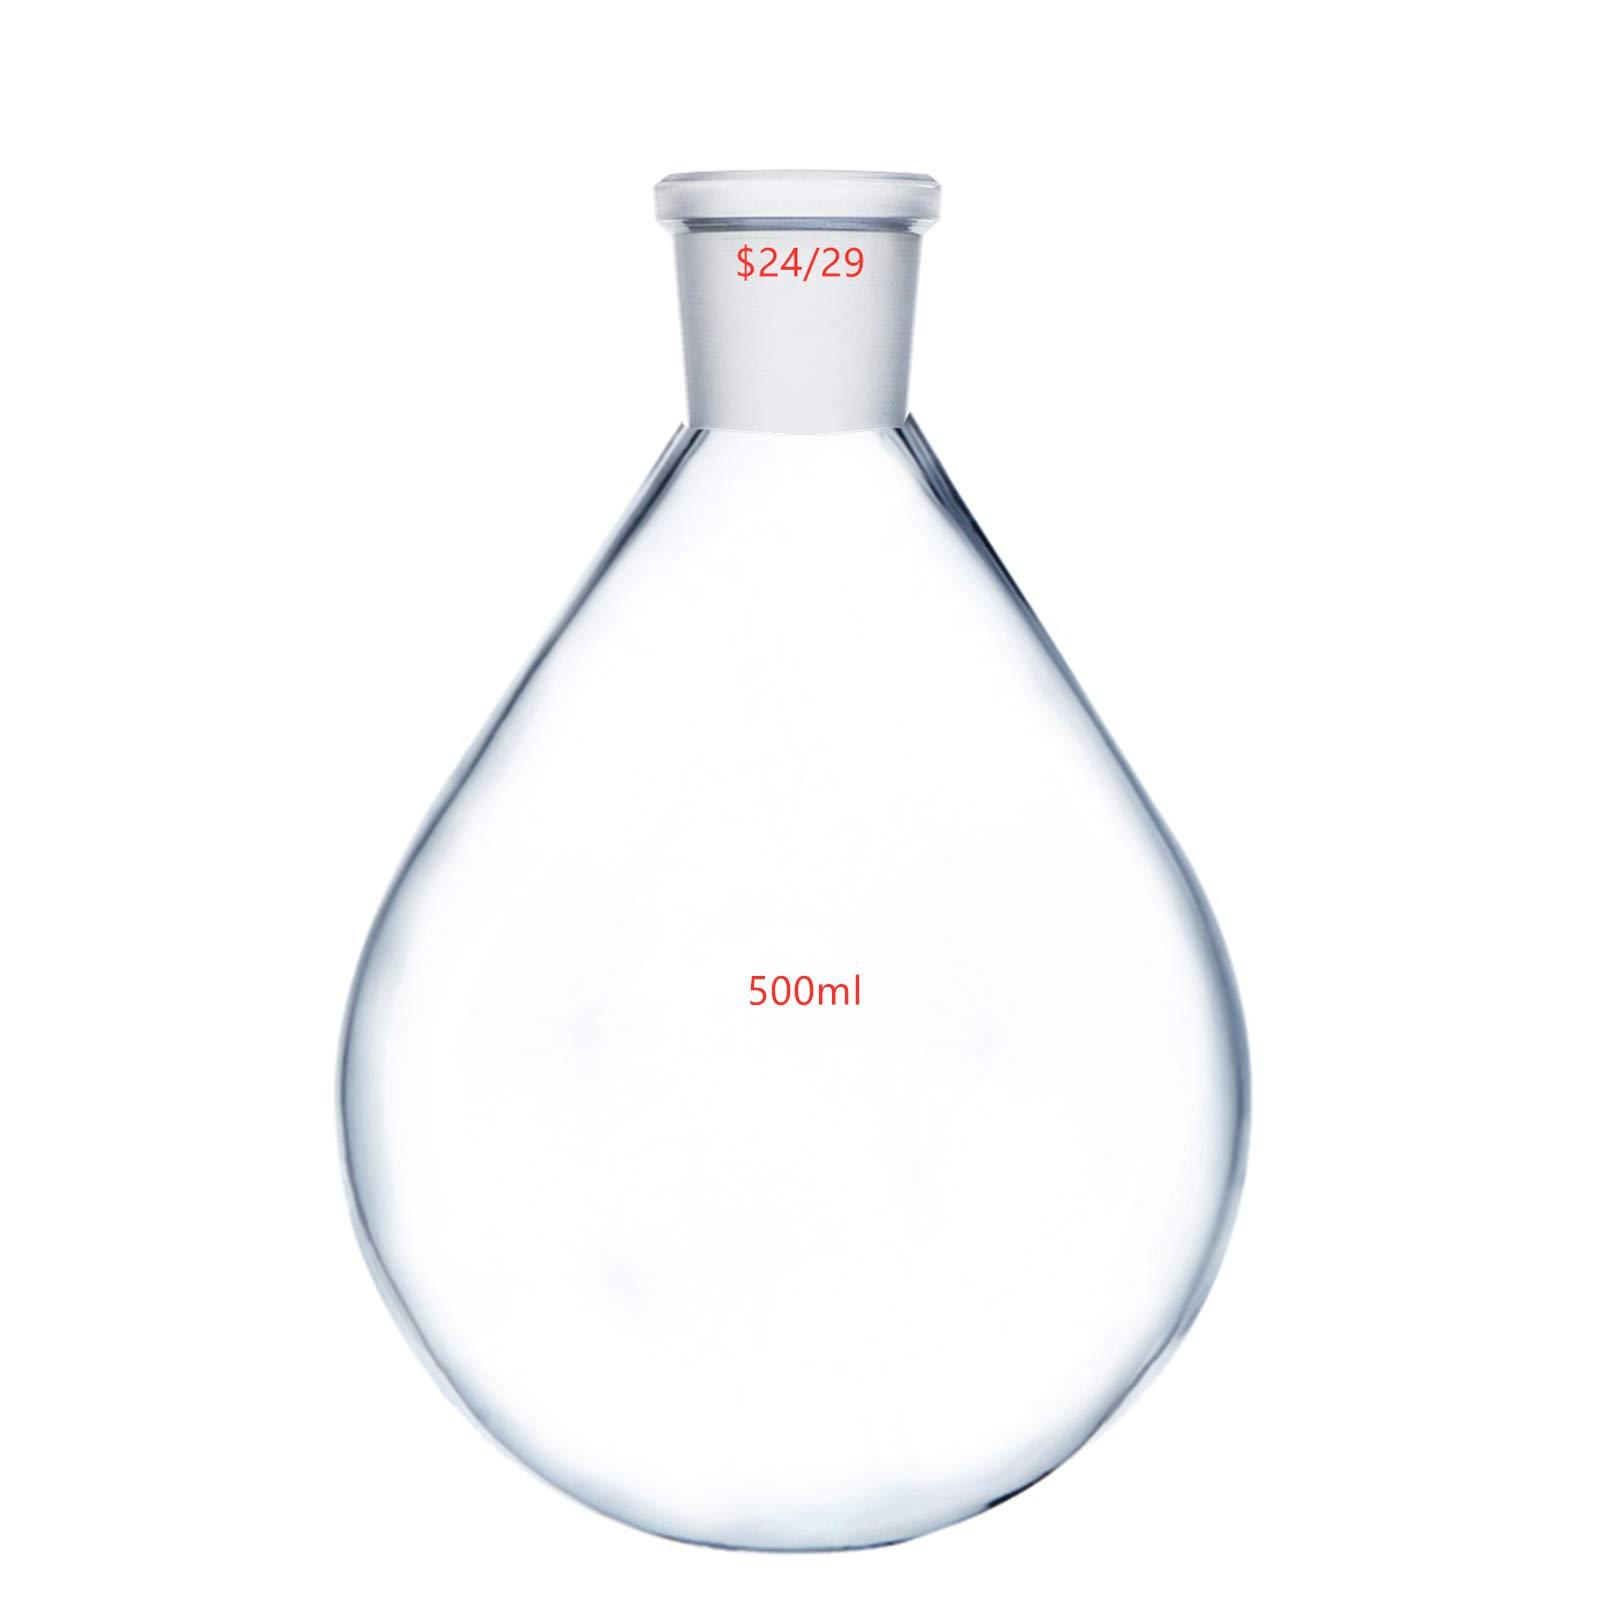 Deschem 500ml 24/29 Glass Recovery Flask Lab Rotary Evaporator Vessel Kjelda Bottle by Deschem